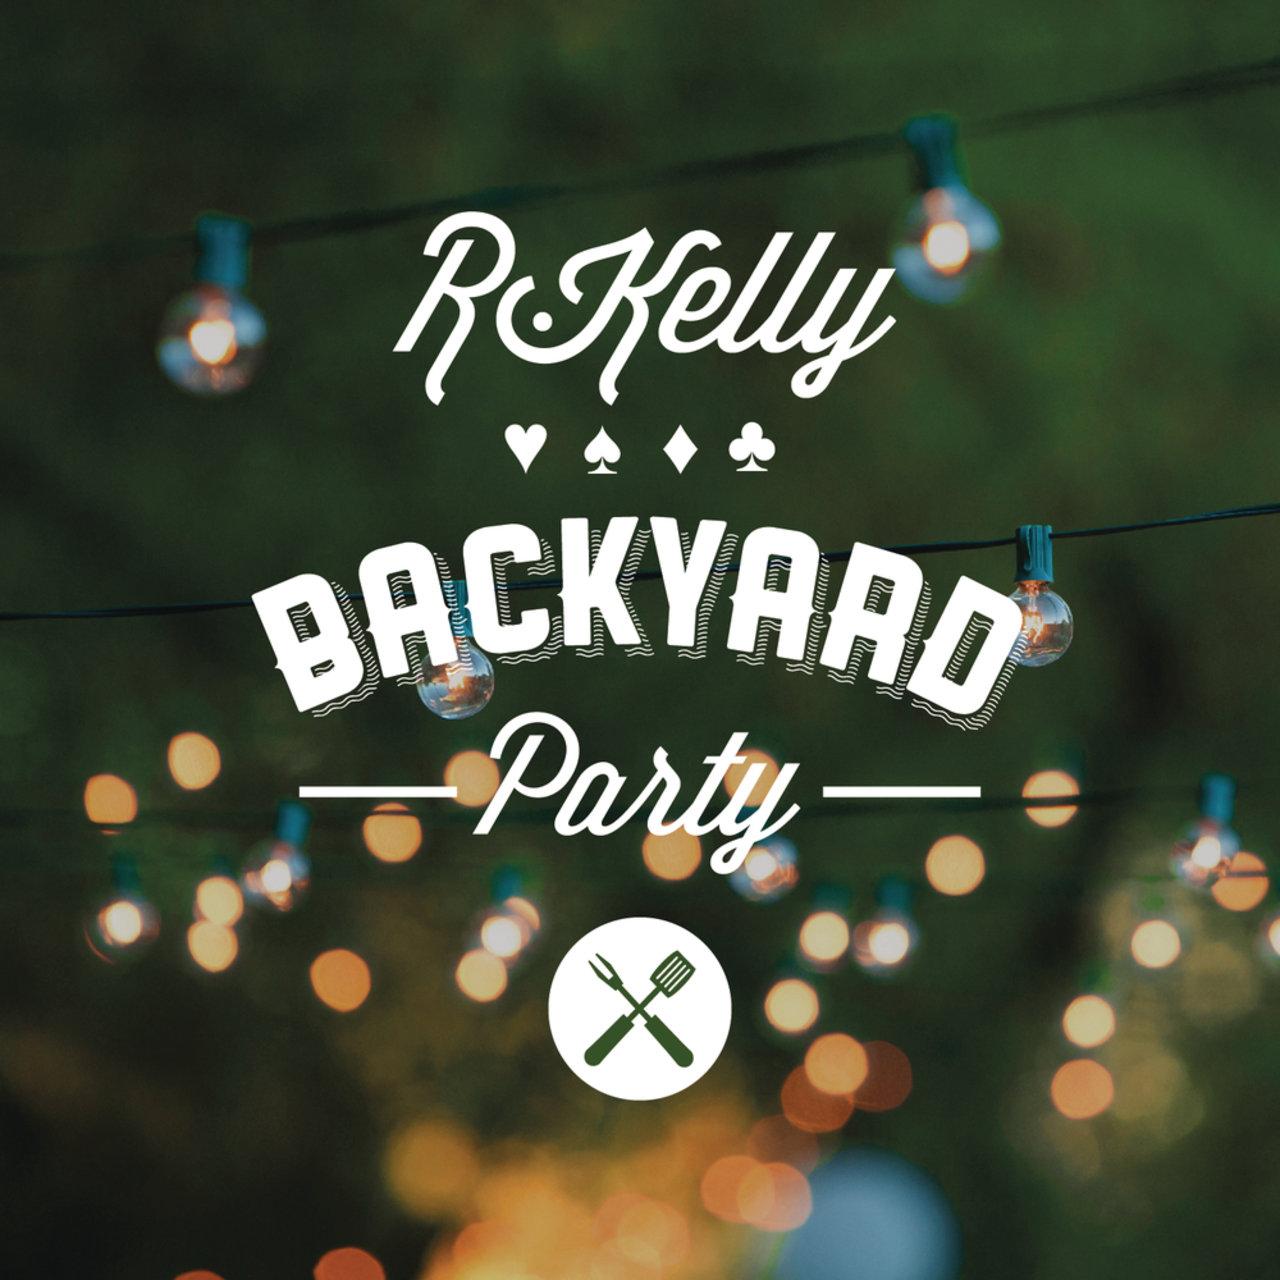 R. Kelly - Backyard Party